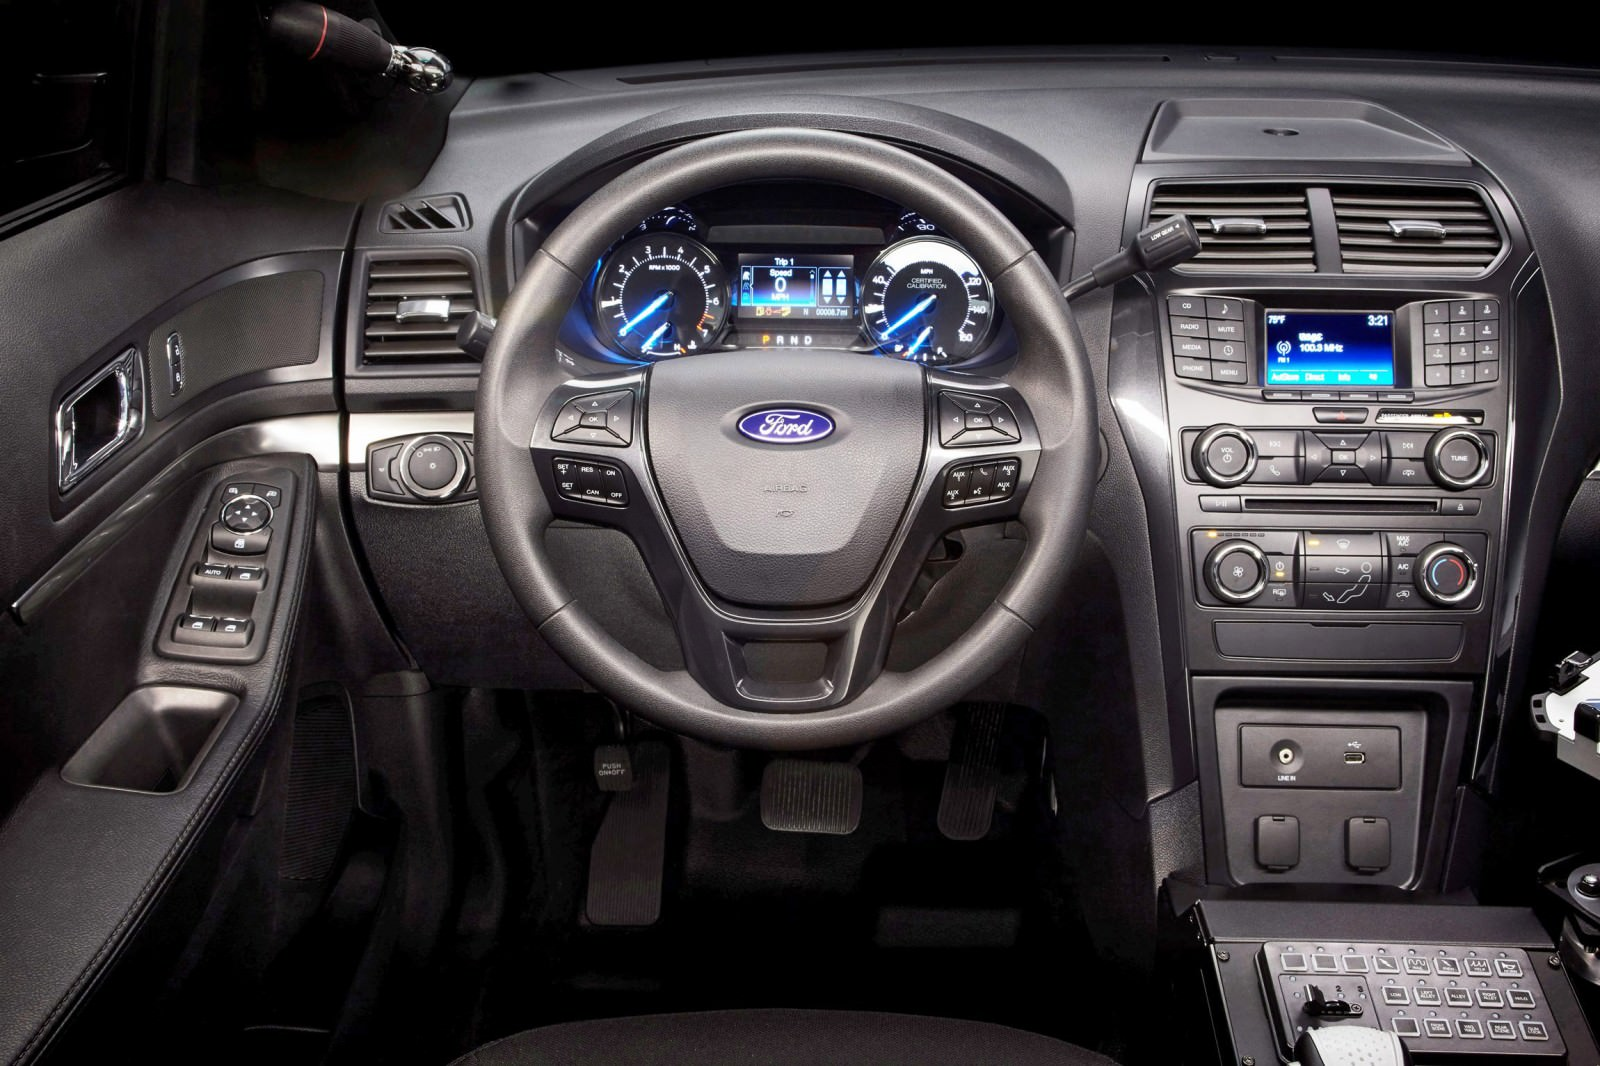 Ford Explorer Police Interceptor X